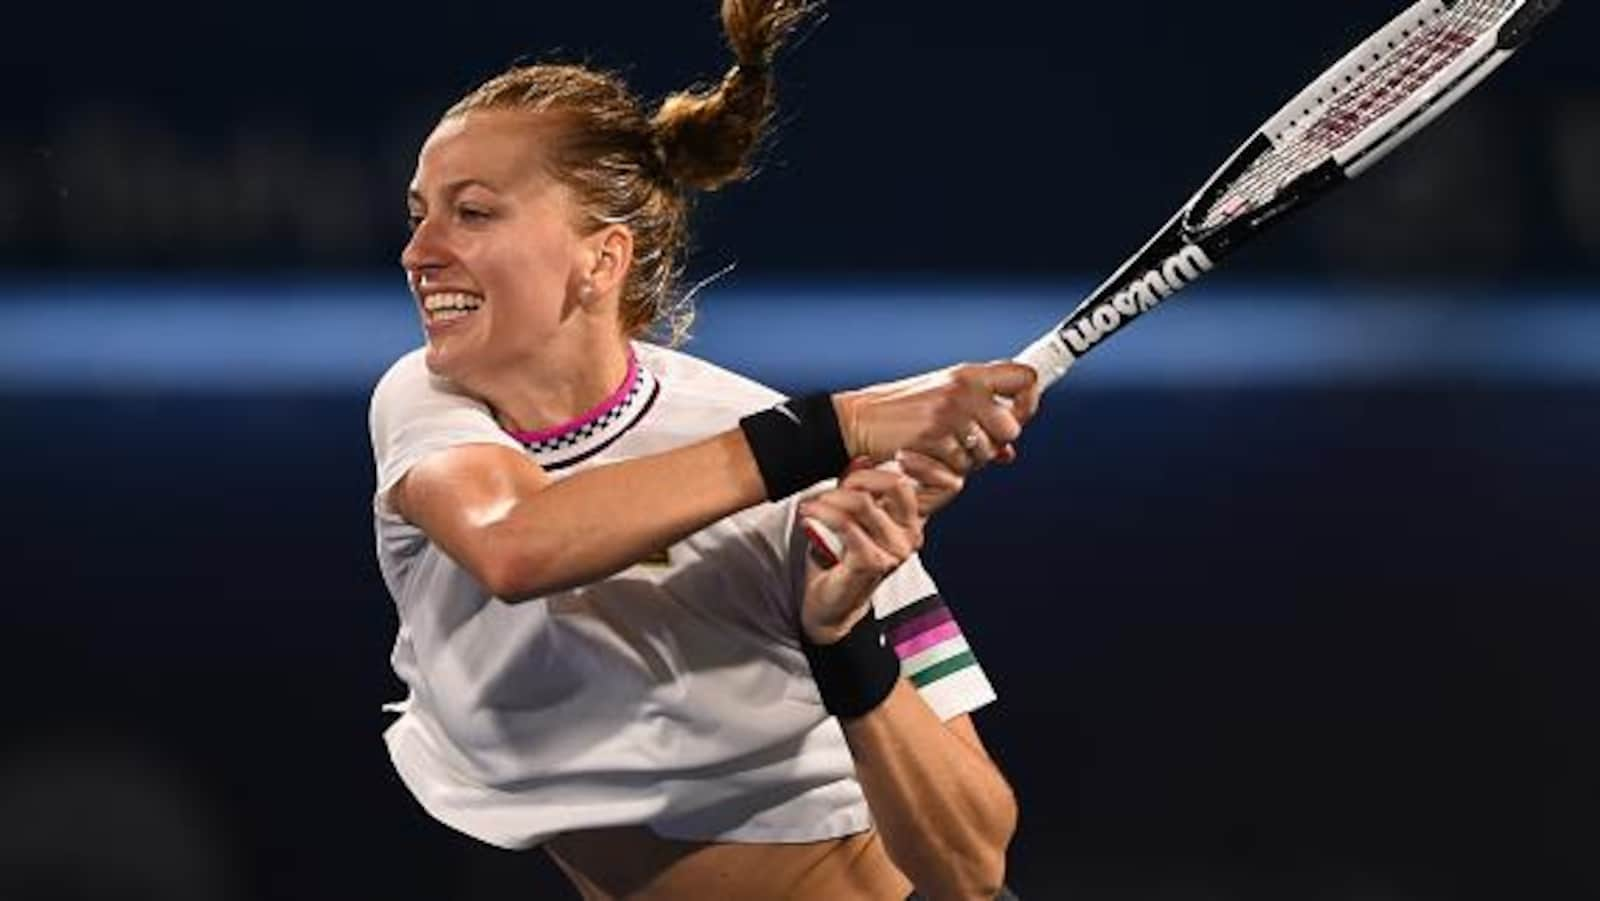 Petra Kvitova frappe un revers en demi-finales contre la Taïwanaise Hsieh Su-wei.